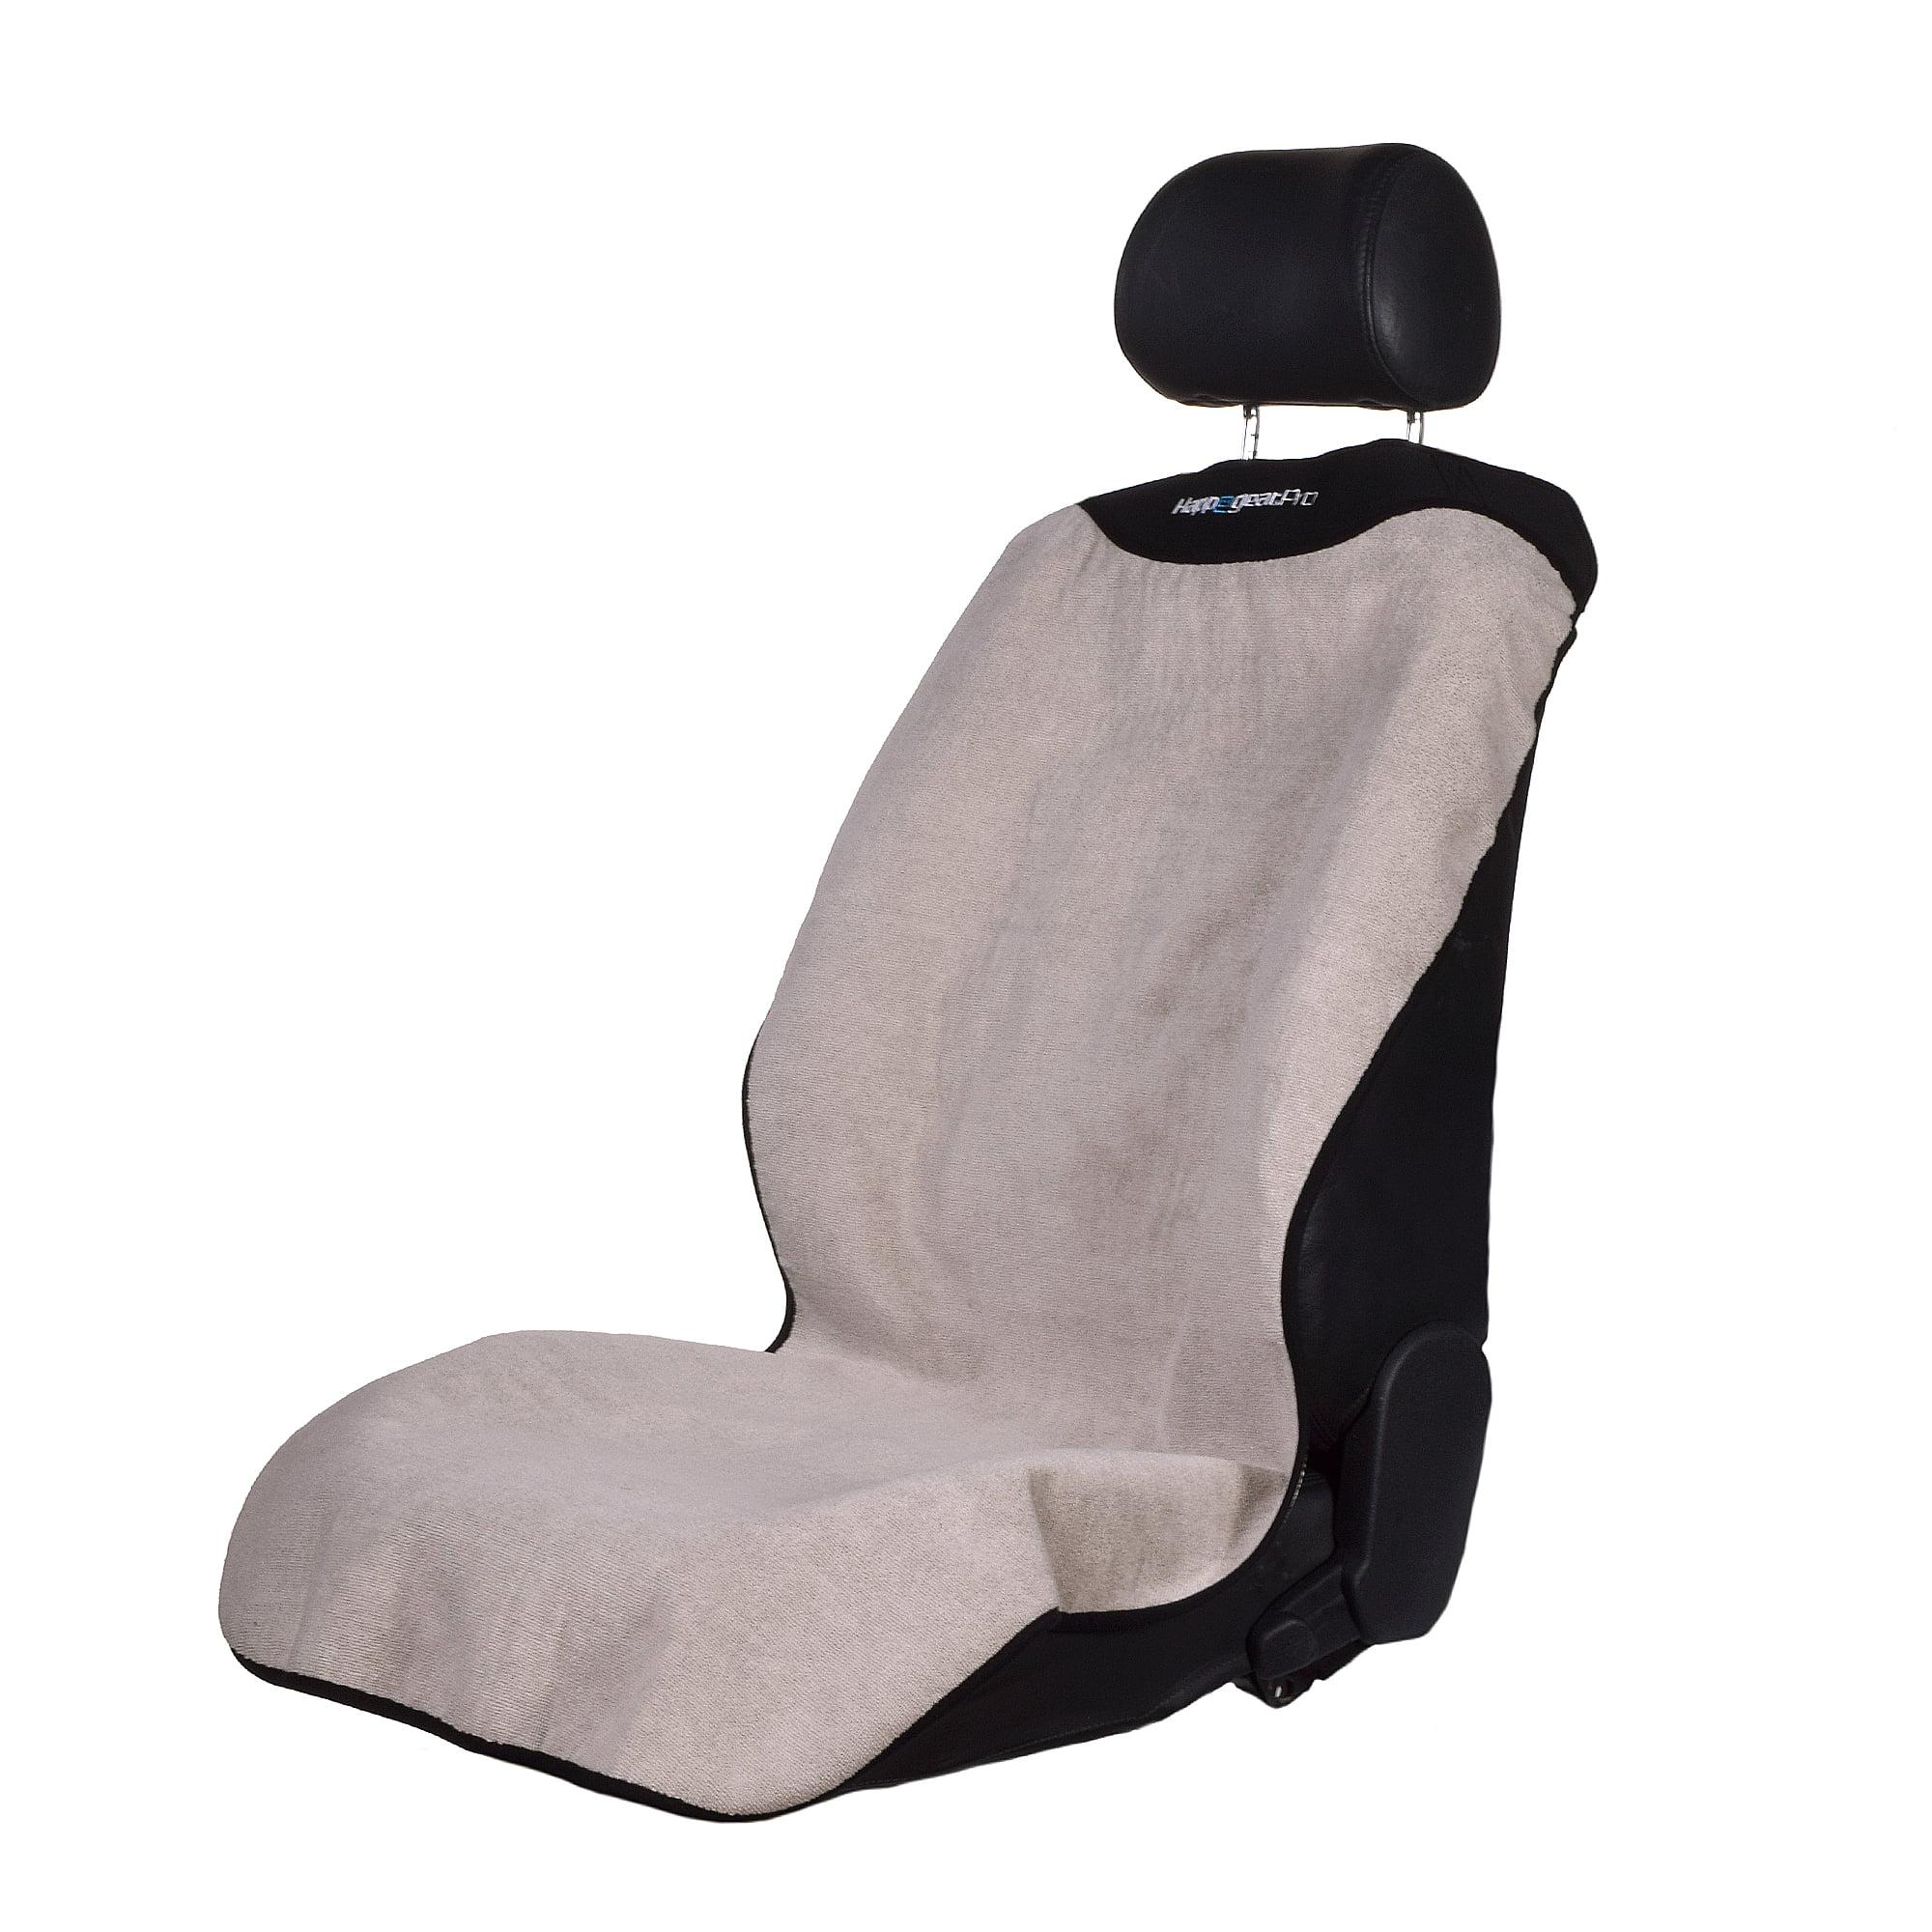 HappegearPro Waterproof Athletic Car Seat Protector